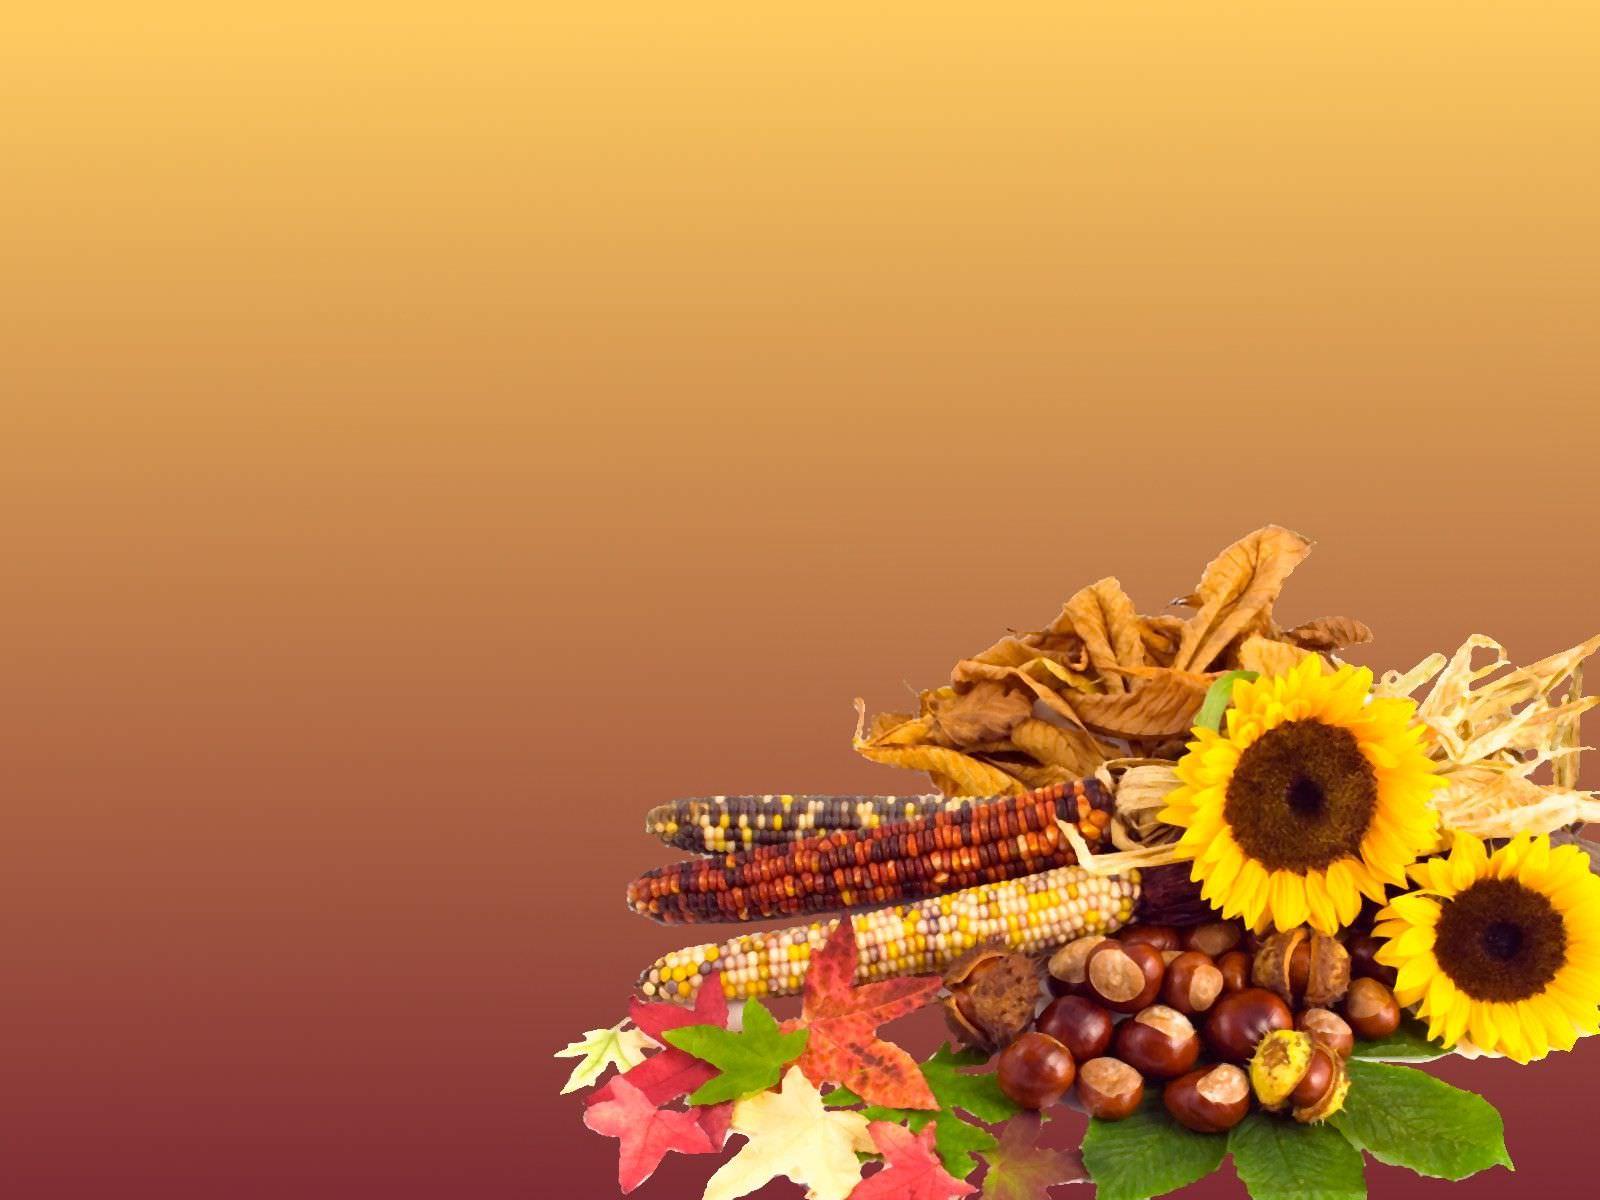 Thanksgiving HD Wallpaper